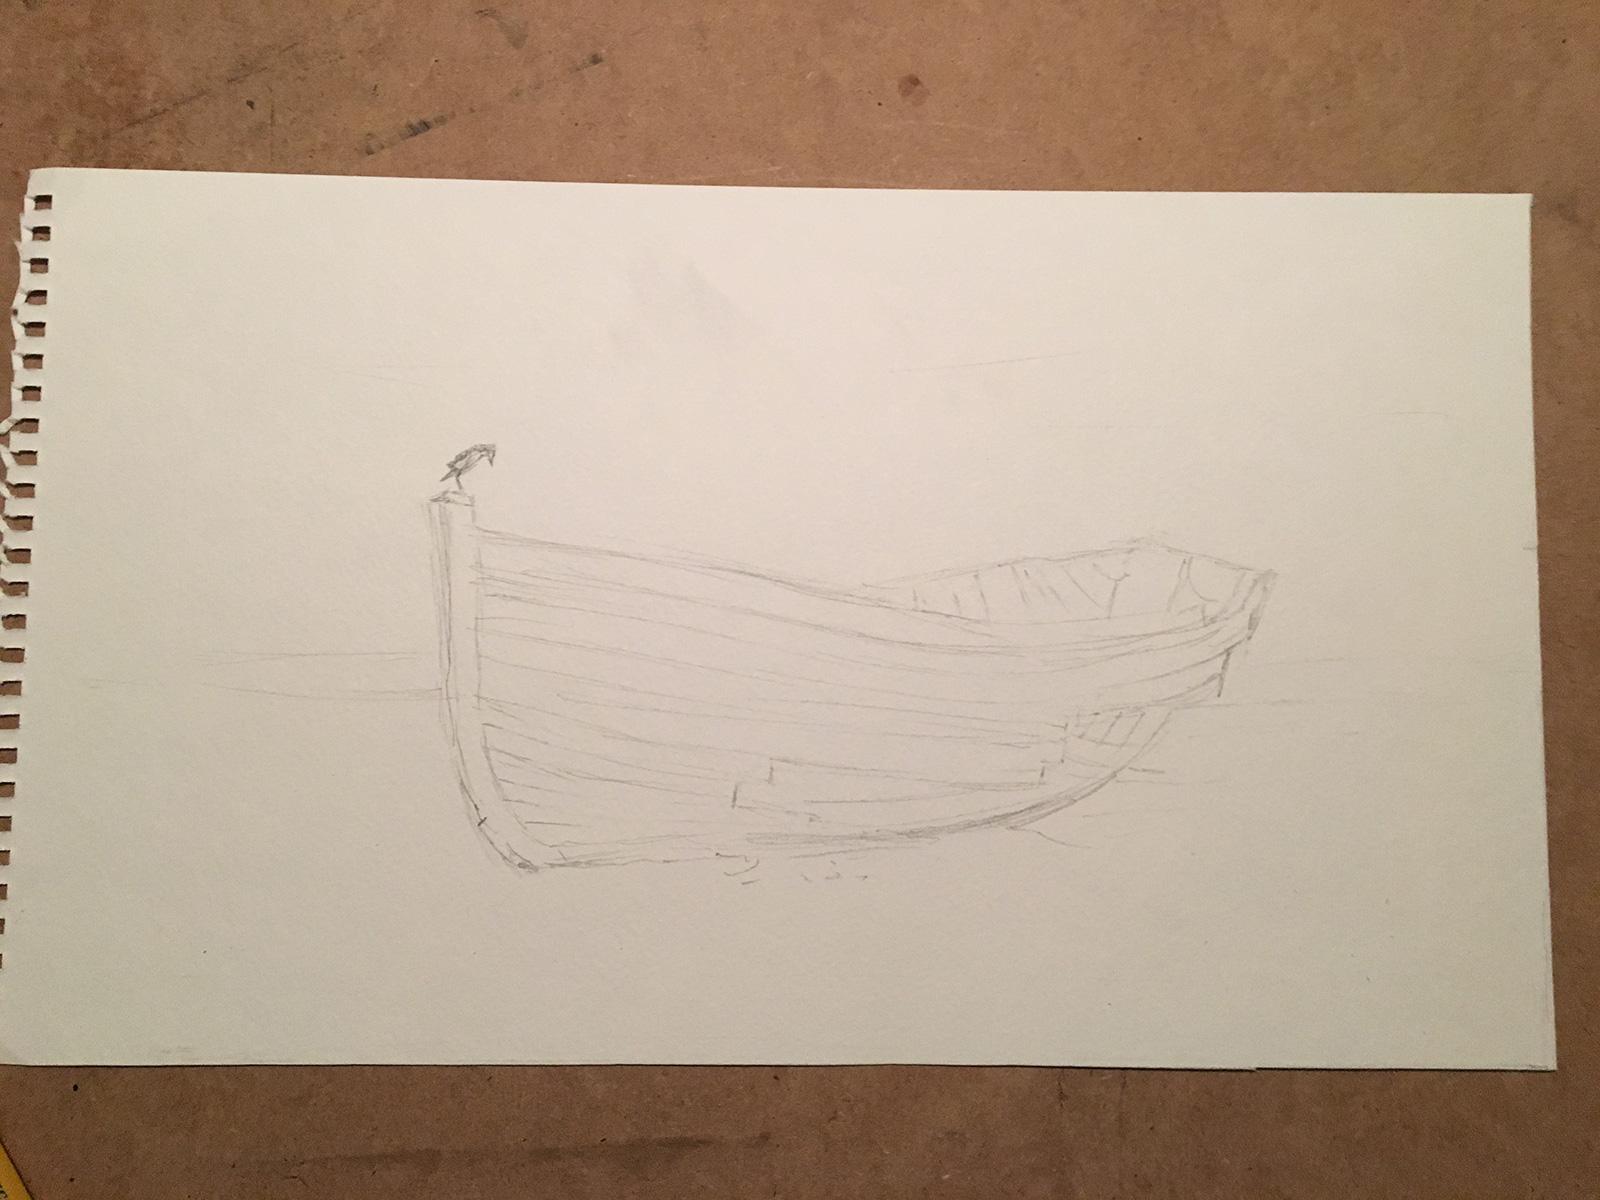 jordan-fretz-design-boat-ink-wash-painting-smaller-1.jpg